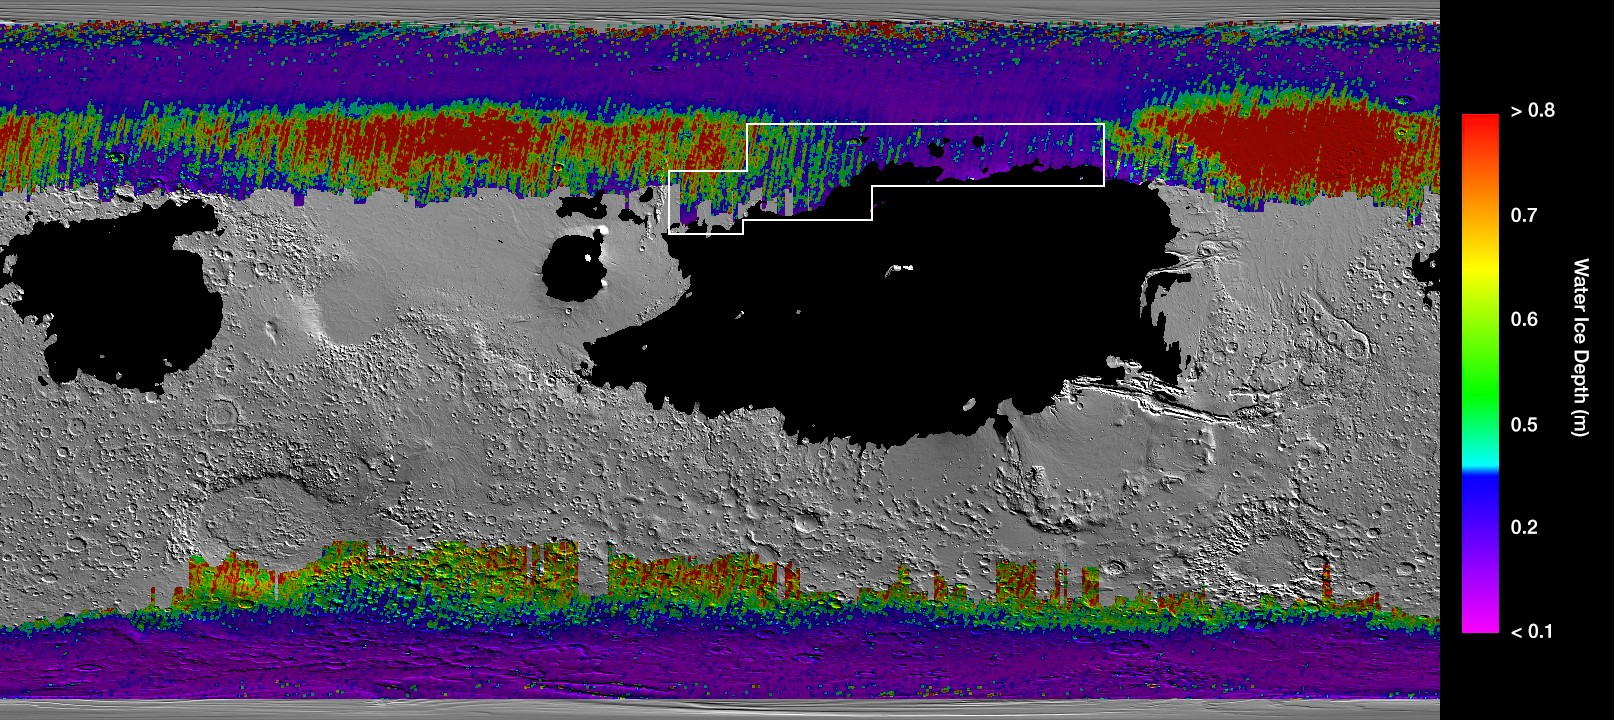 Mars subsurface water data